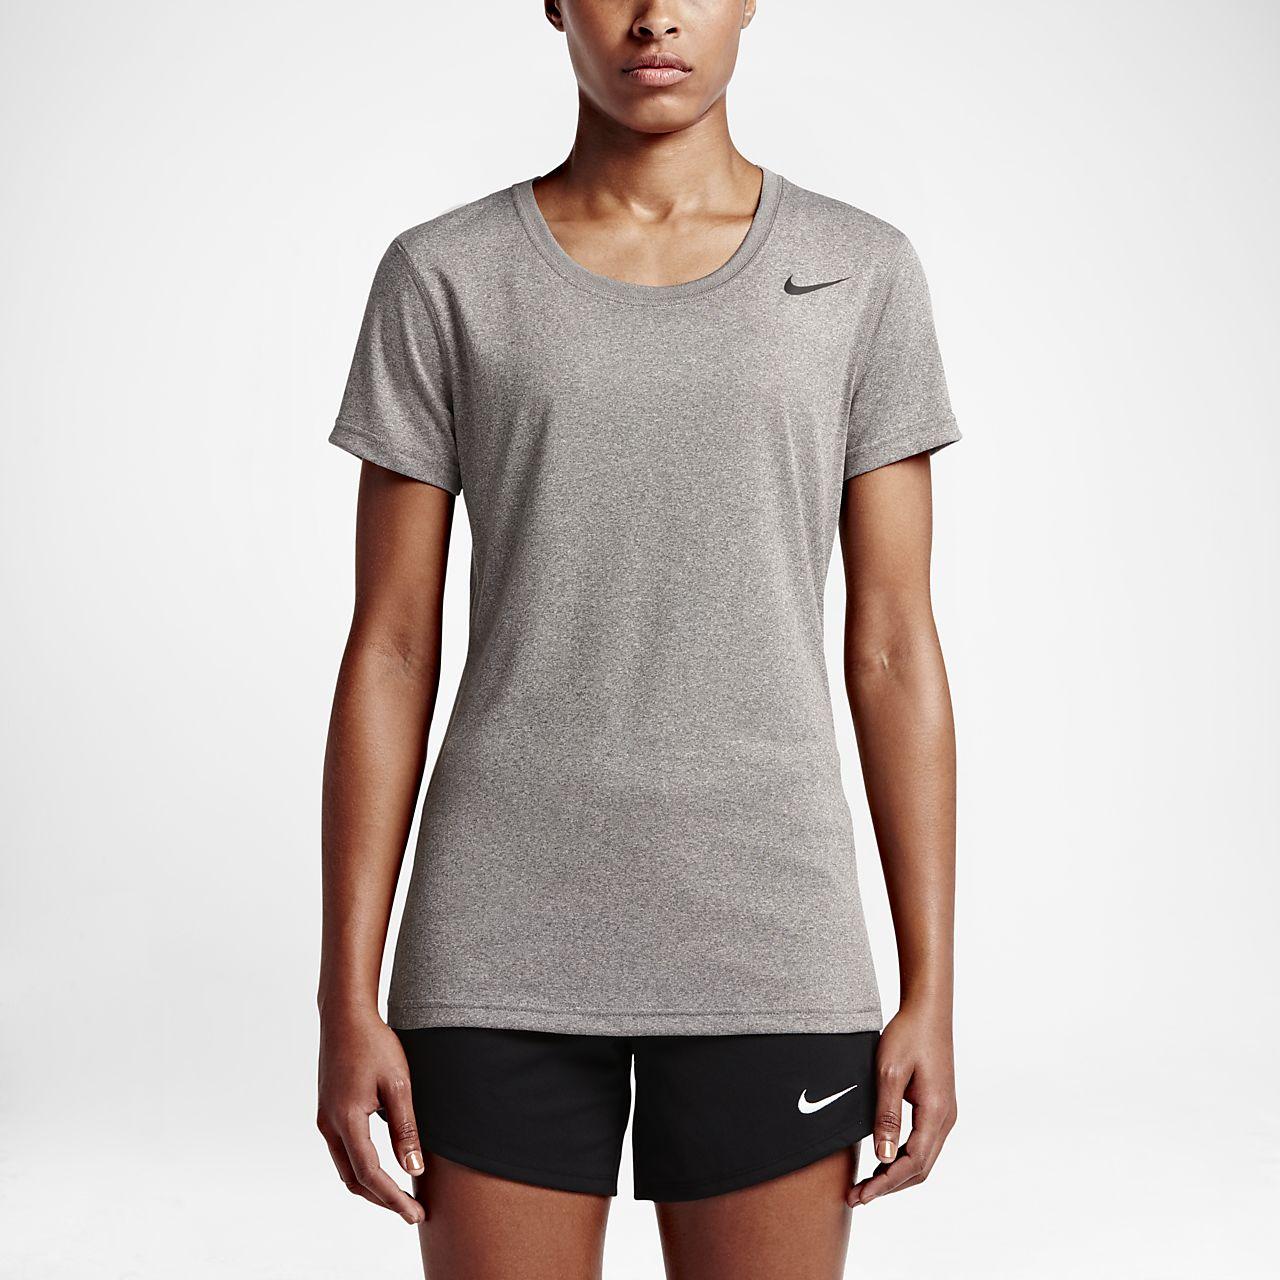 Nike Legend Women's Short Sleeve Training Top